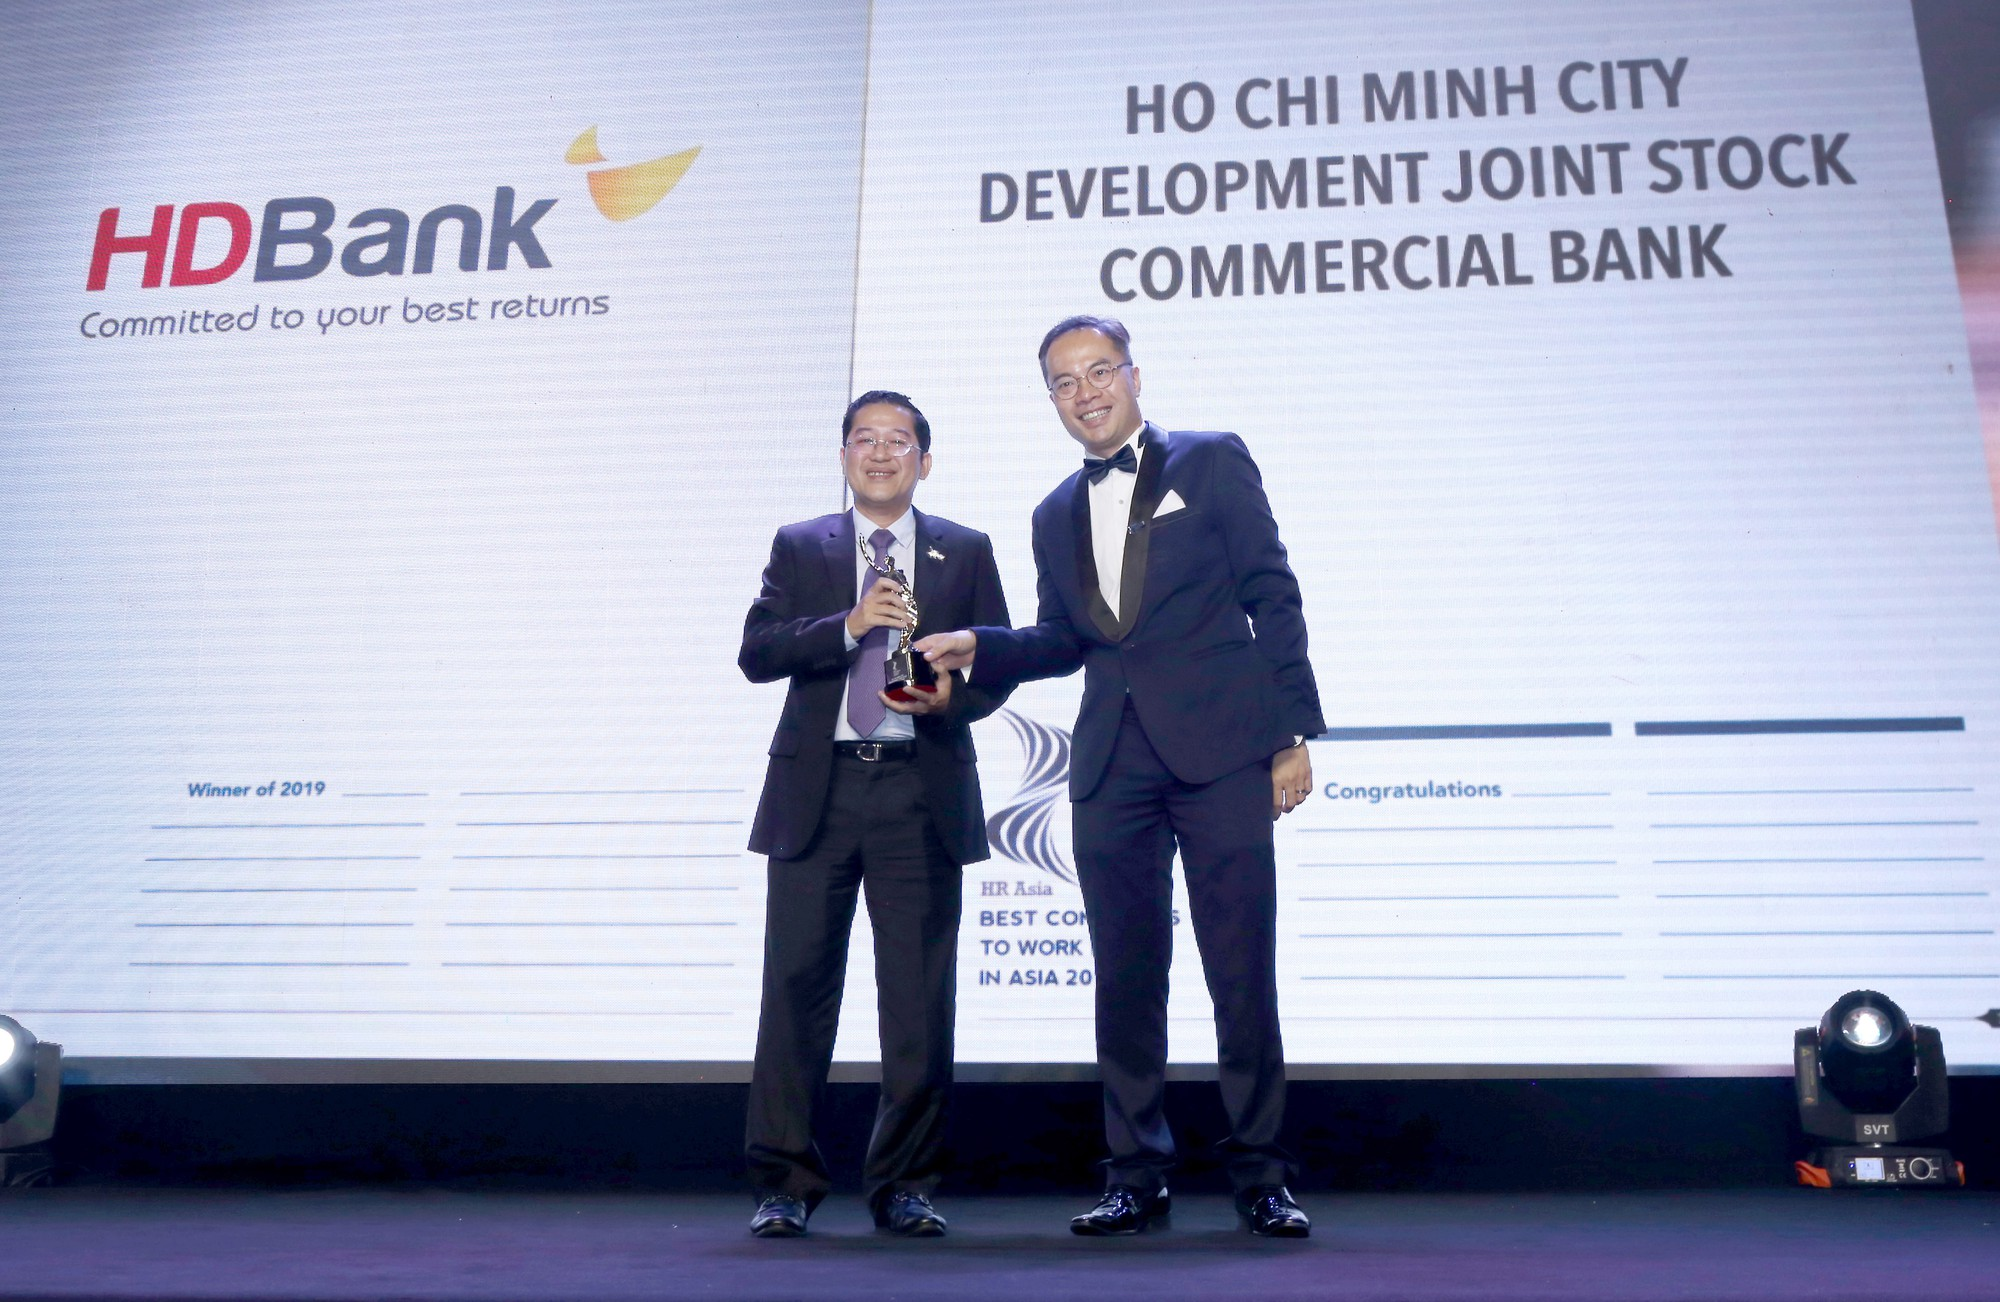 HDBank - HR Asia 1